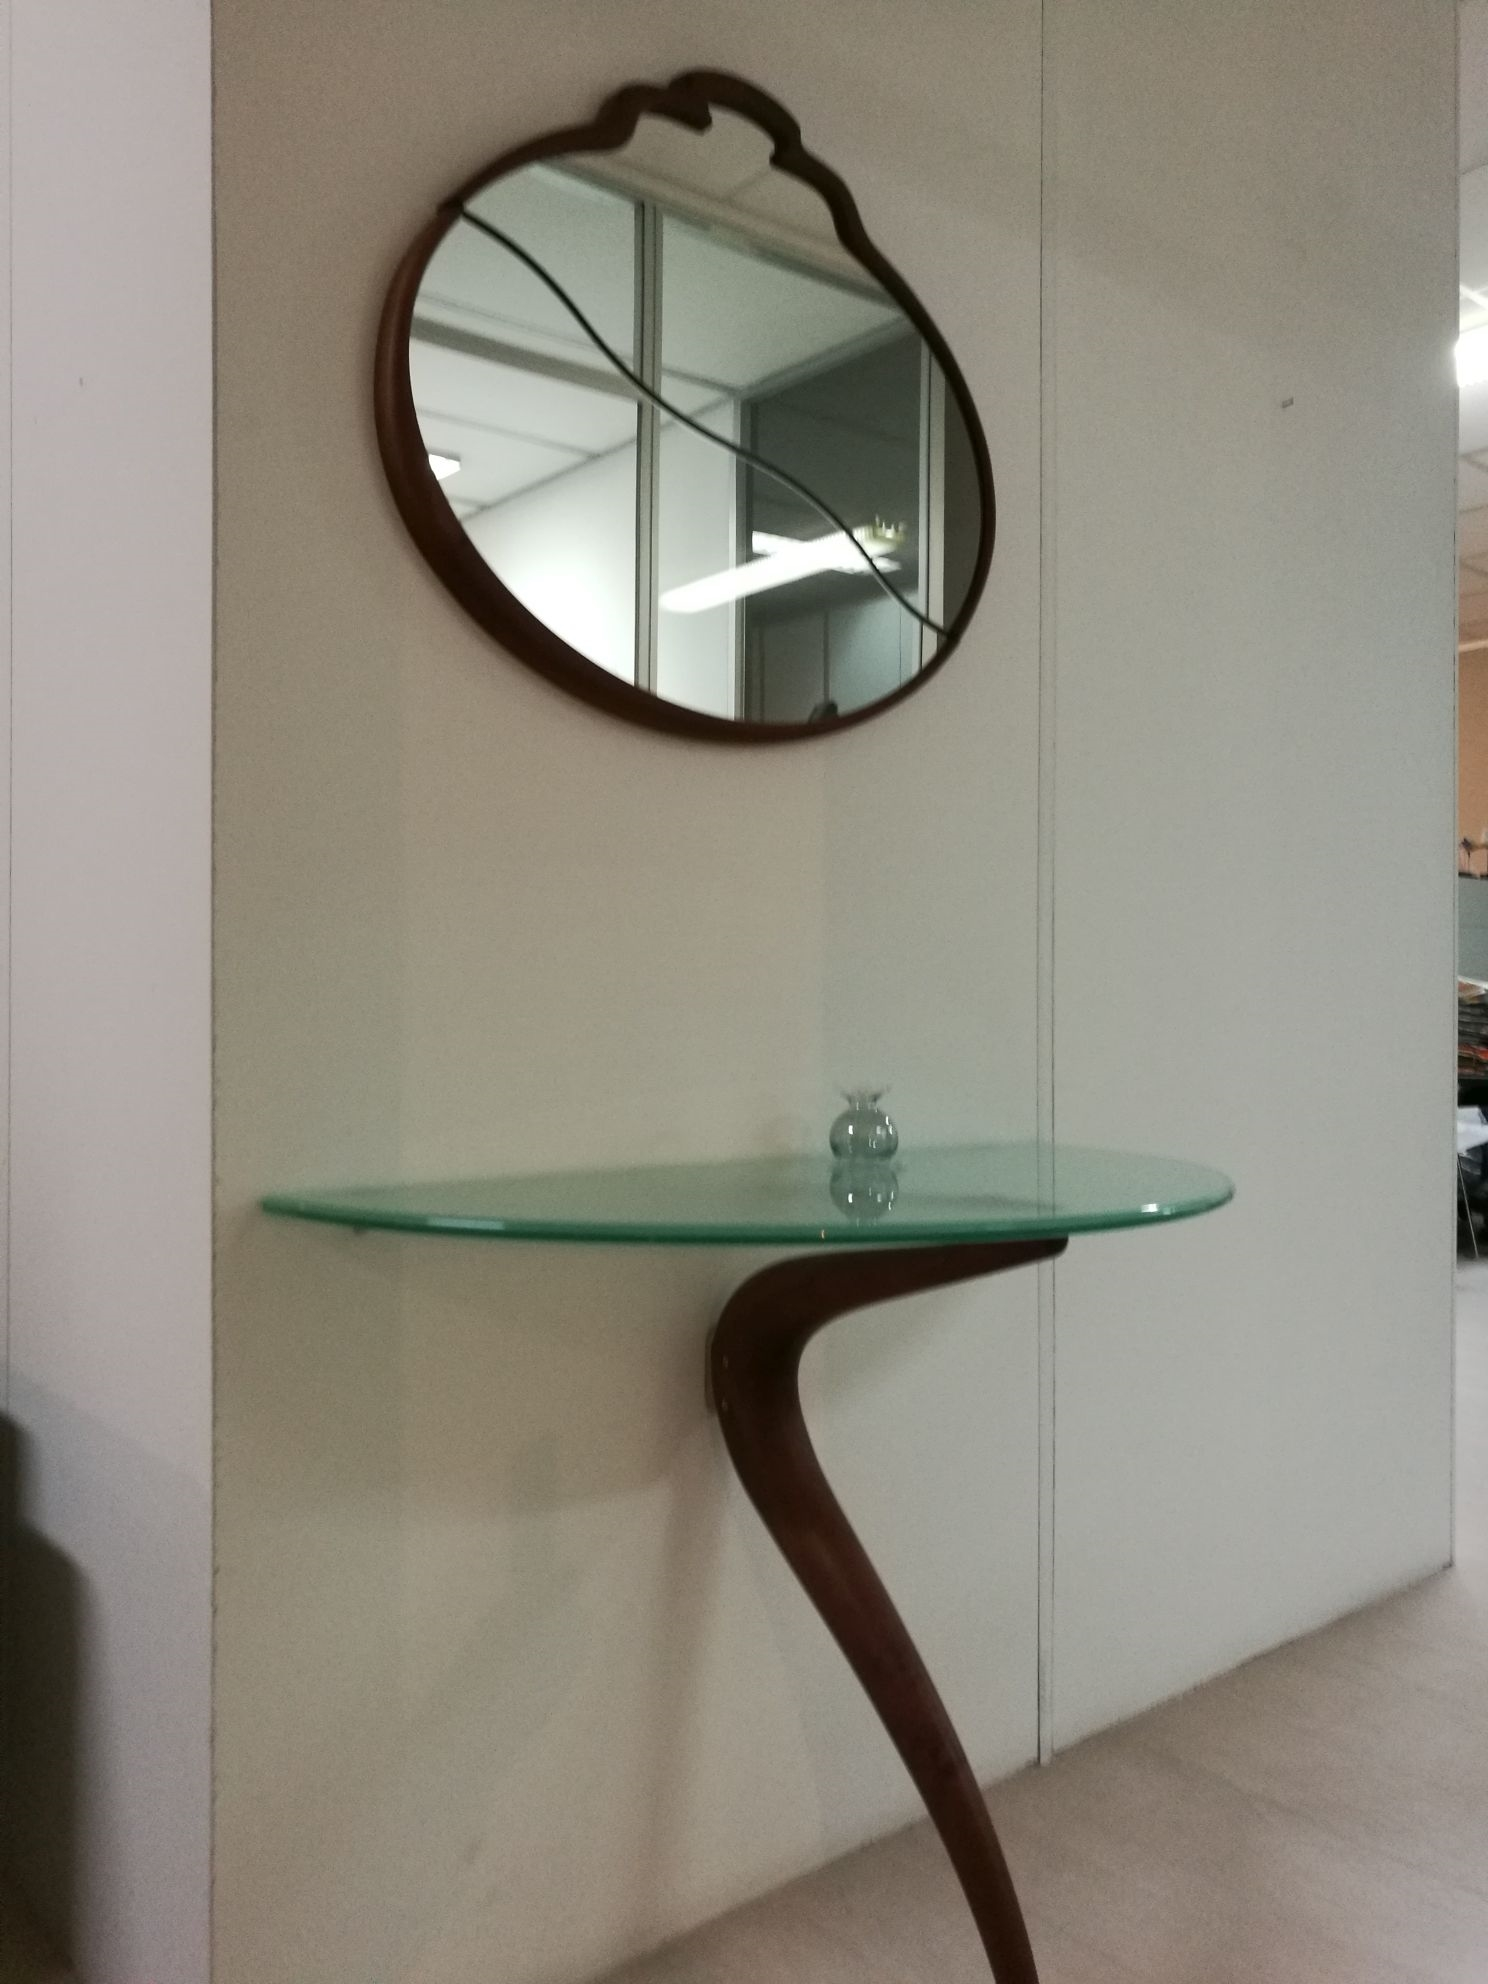 Amato Complemento Porada Porada consolle puhky e specchio miteo scontato  JZ06